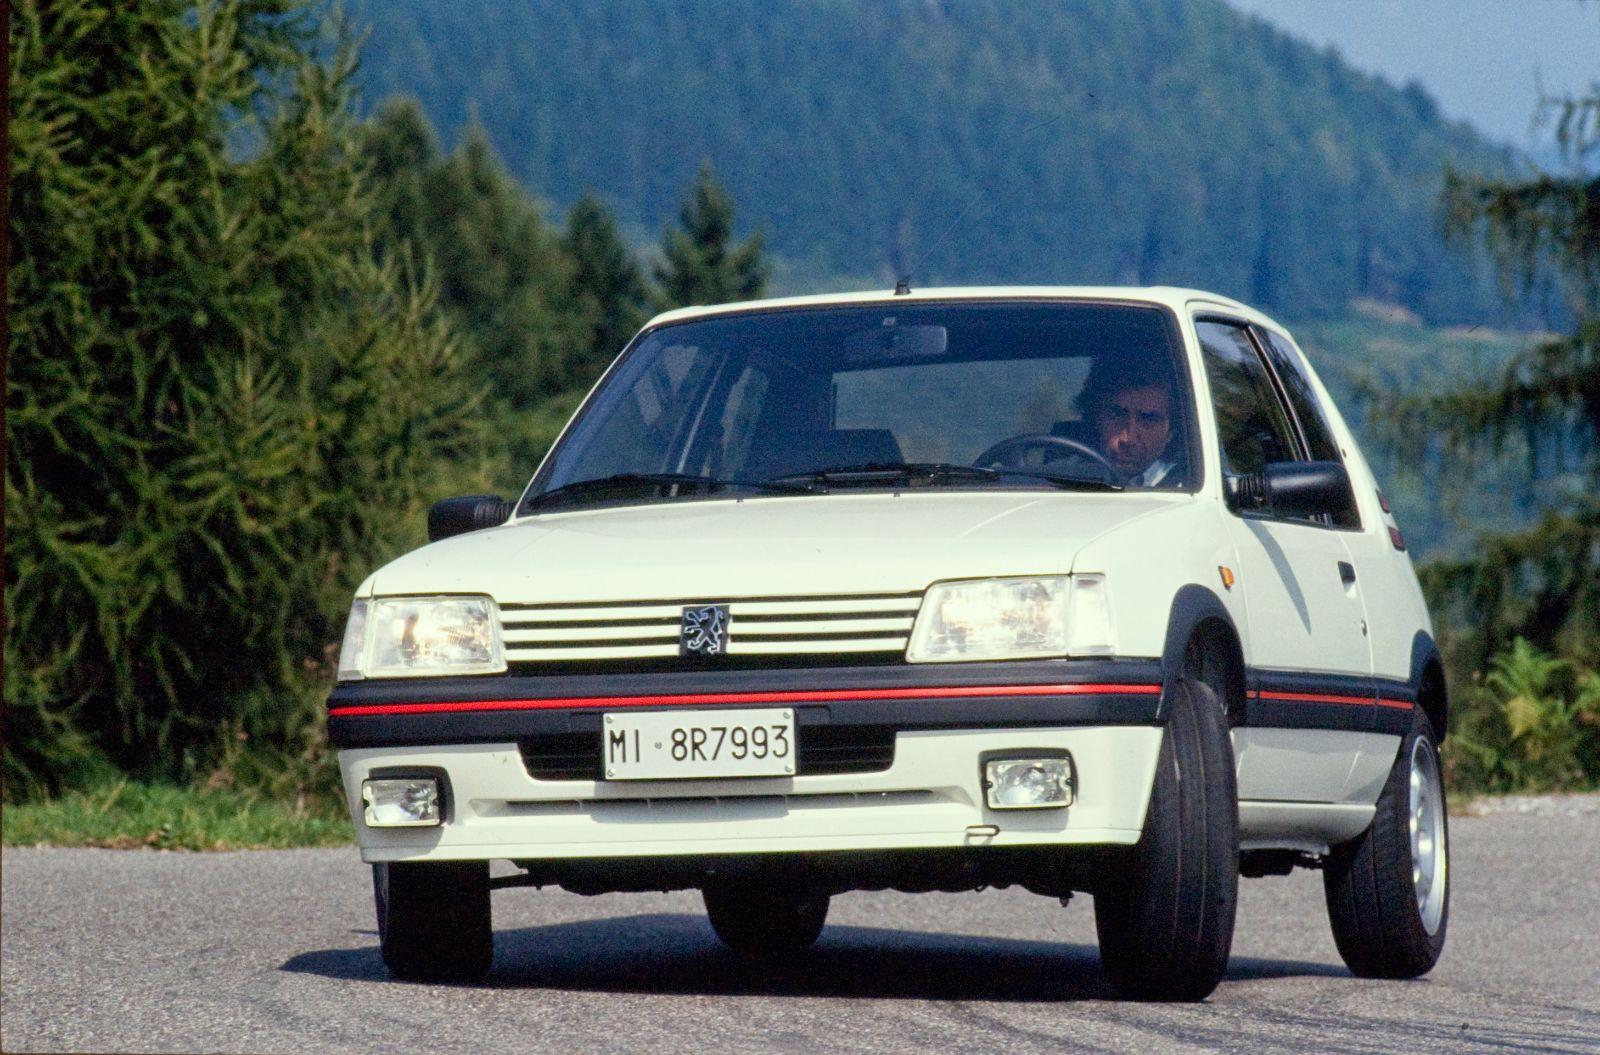 peugeot-205-gti-1-9-1990-5